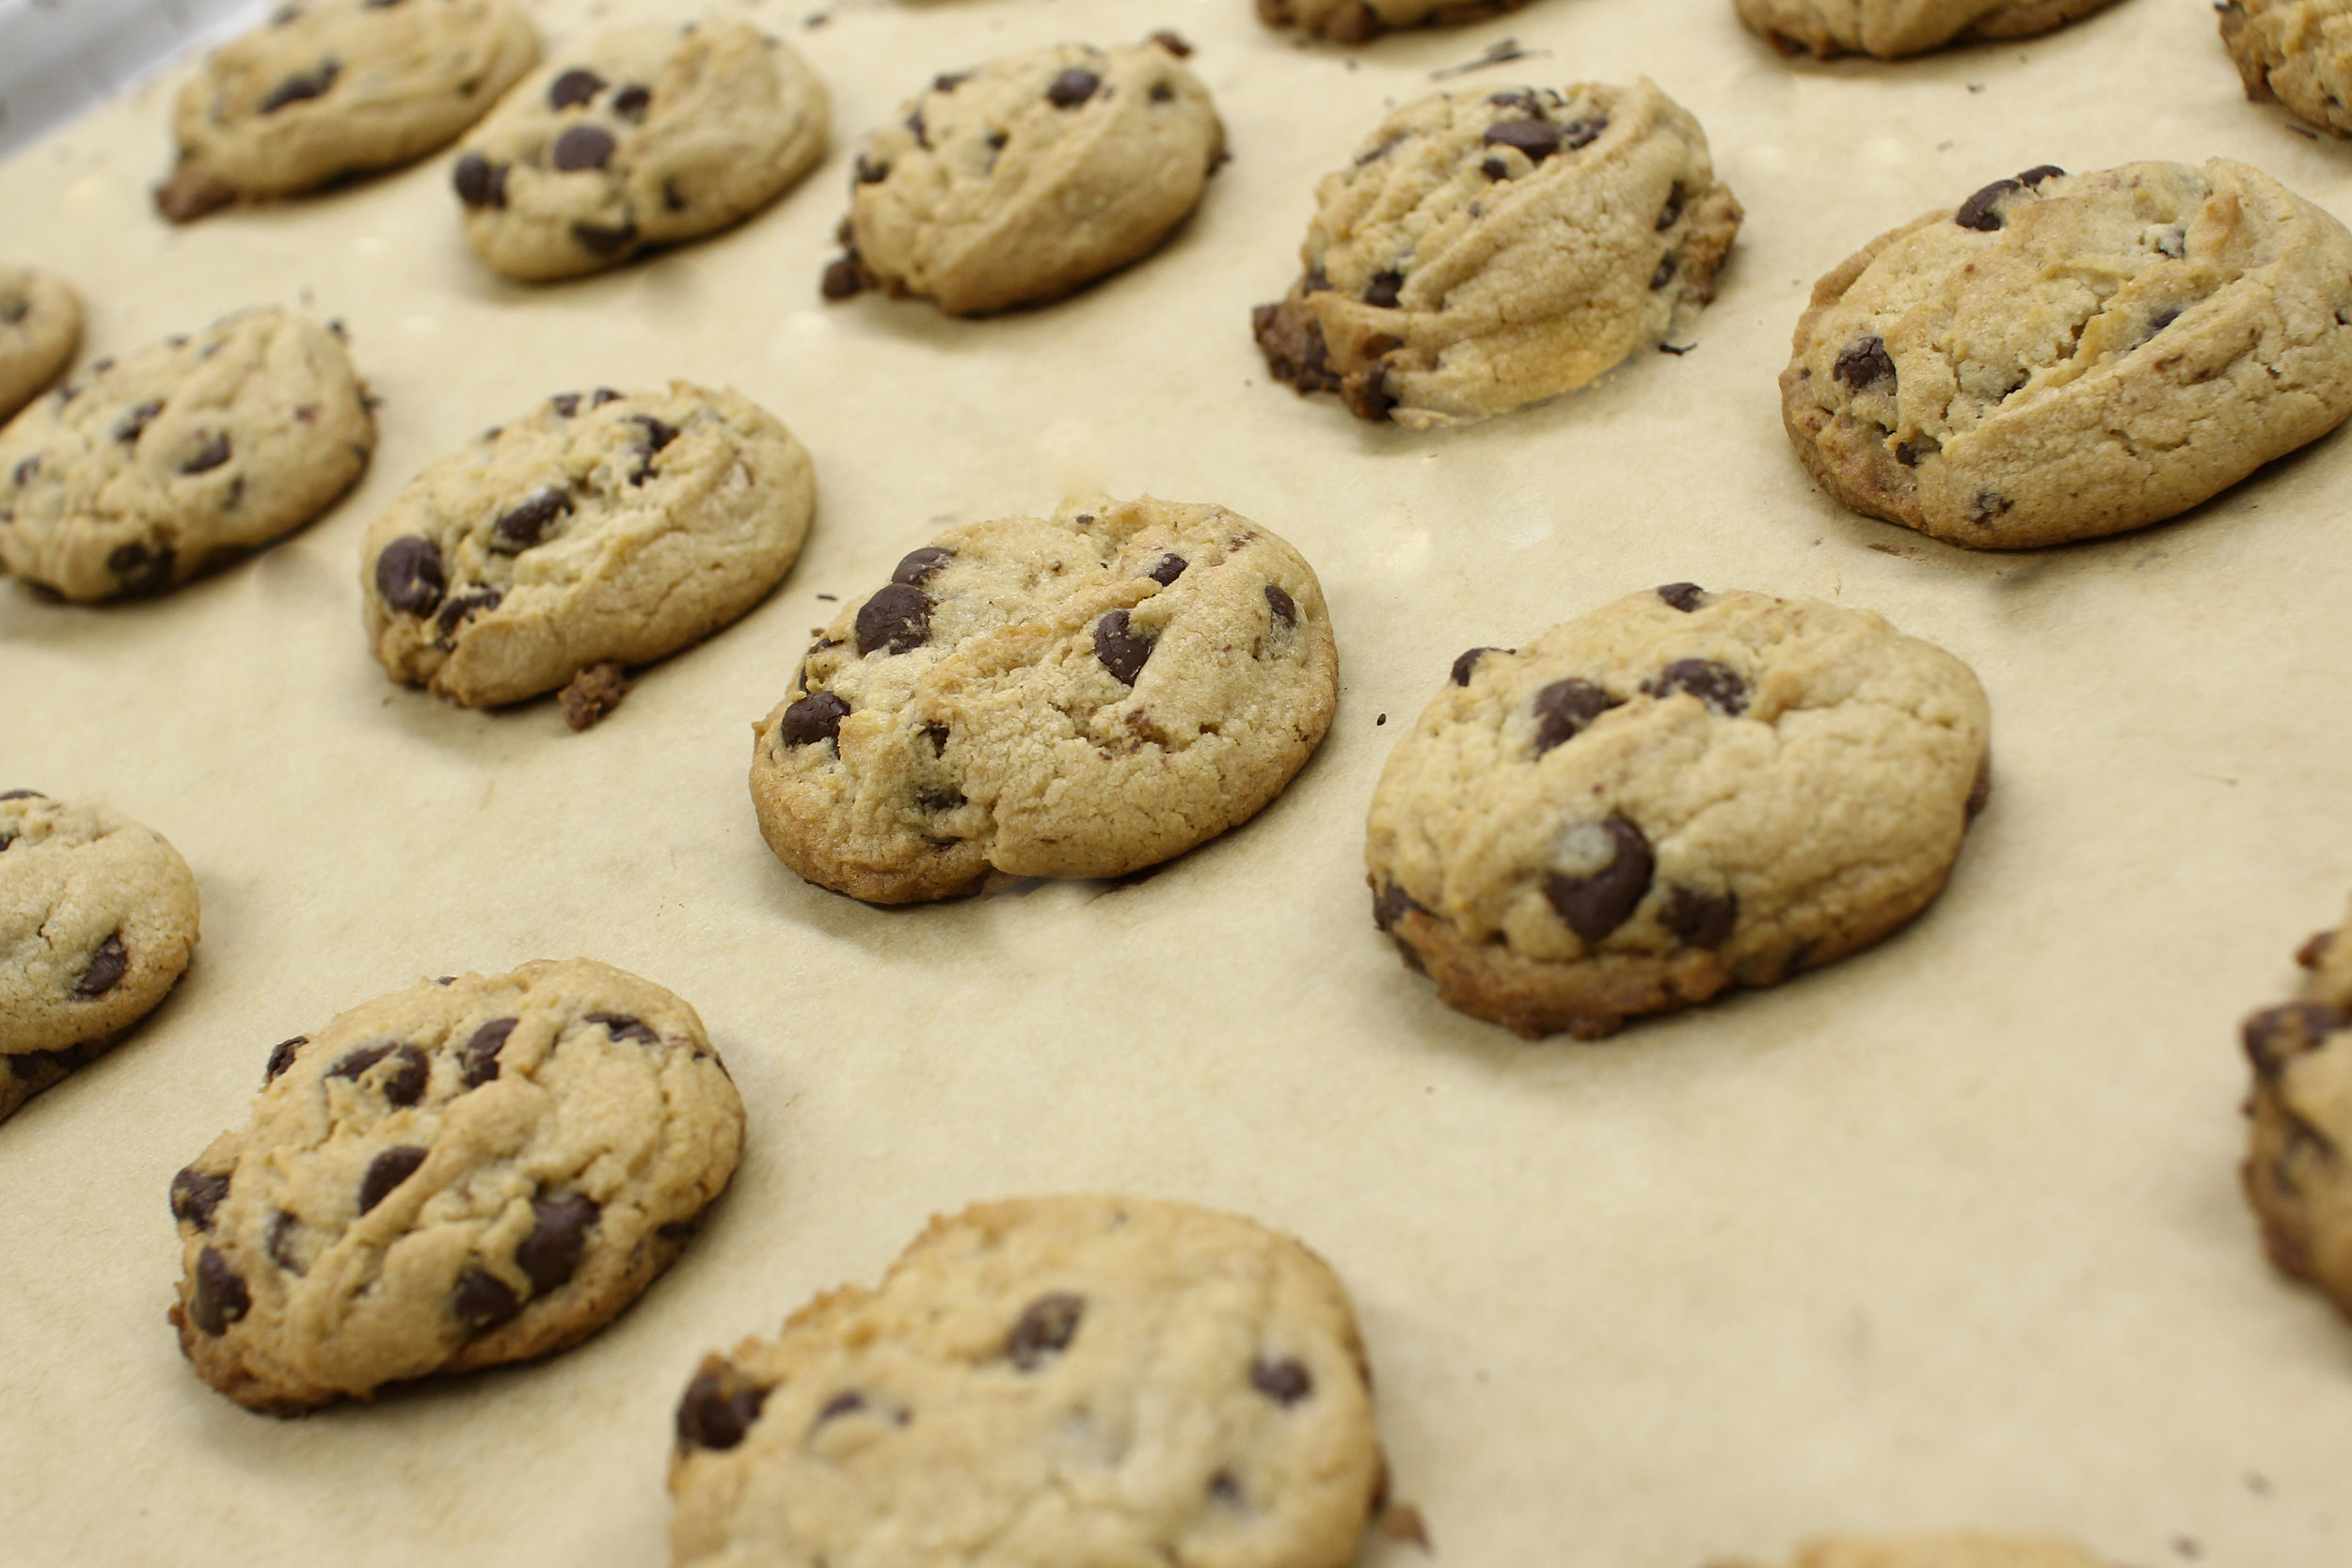 Chocolate Chip Cookies, photo taken by Steve Hazel